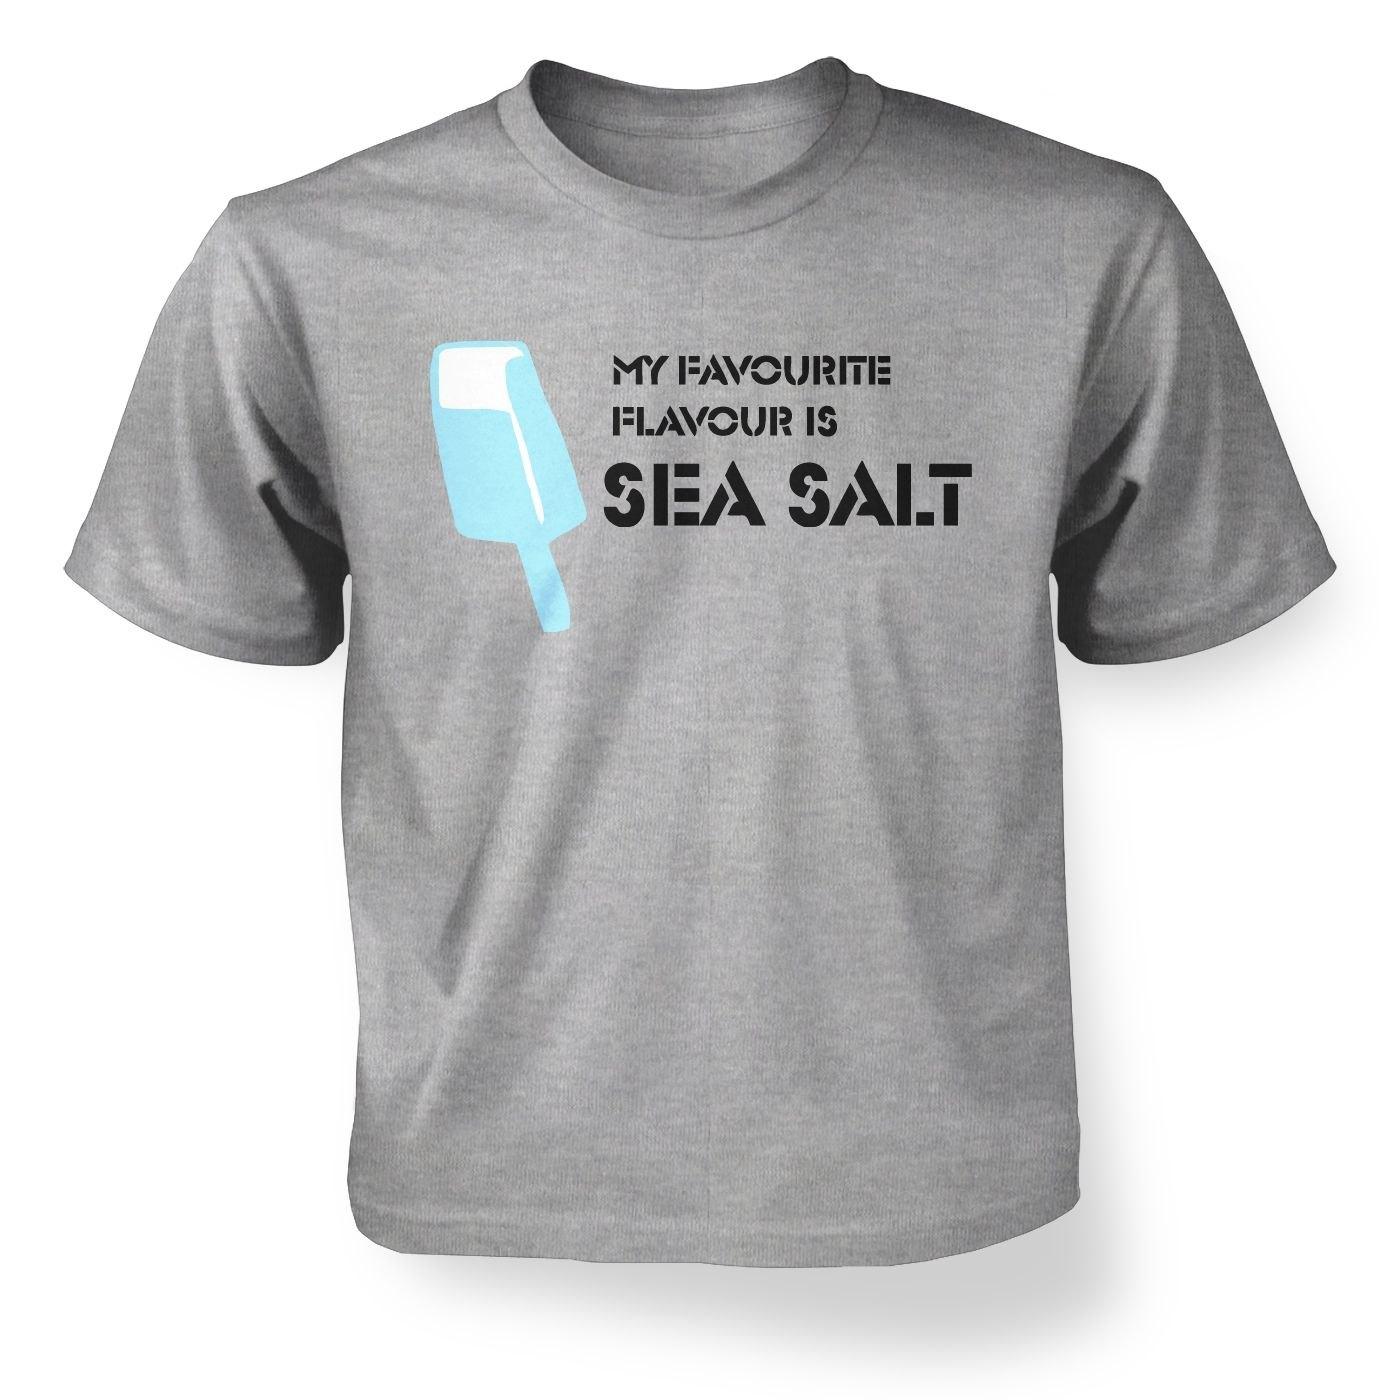 Sea Salt Ice Cream kids' t-shirt